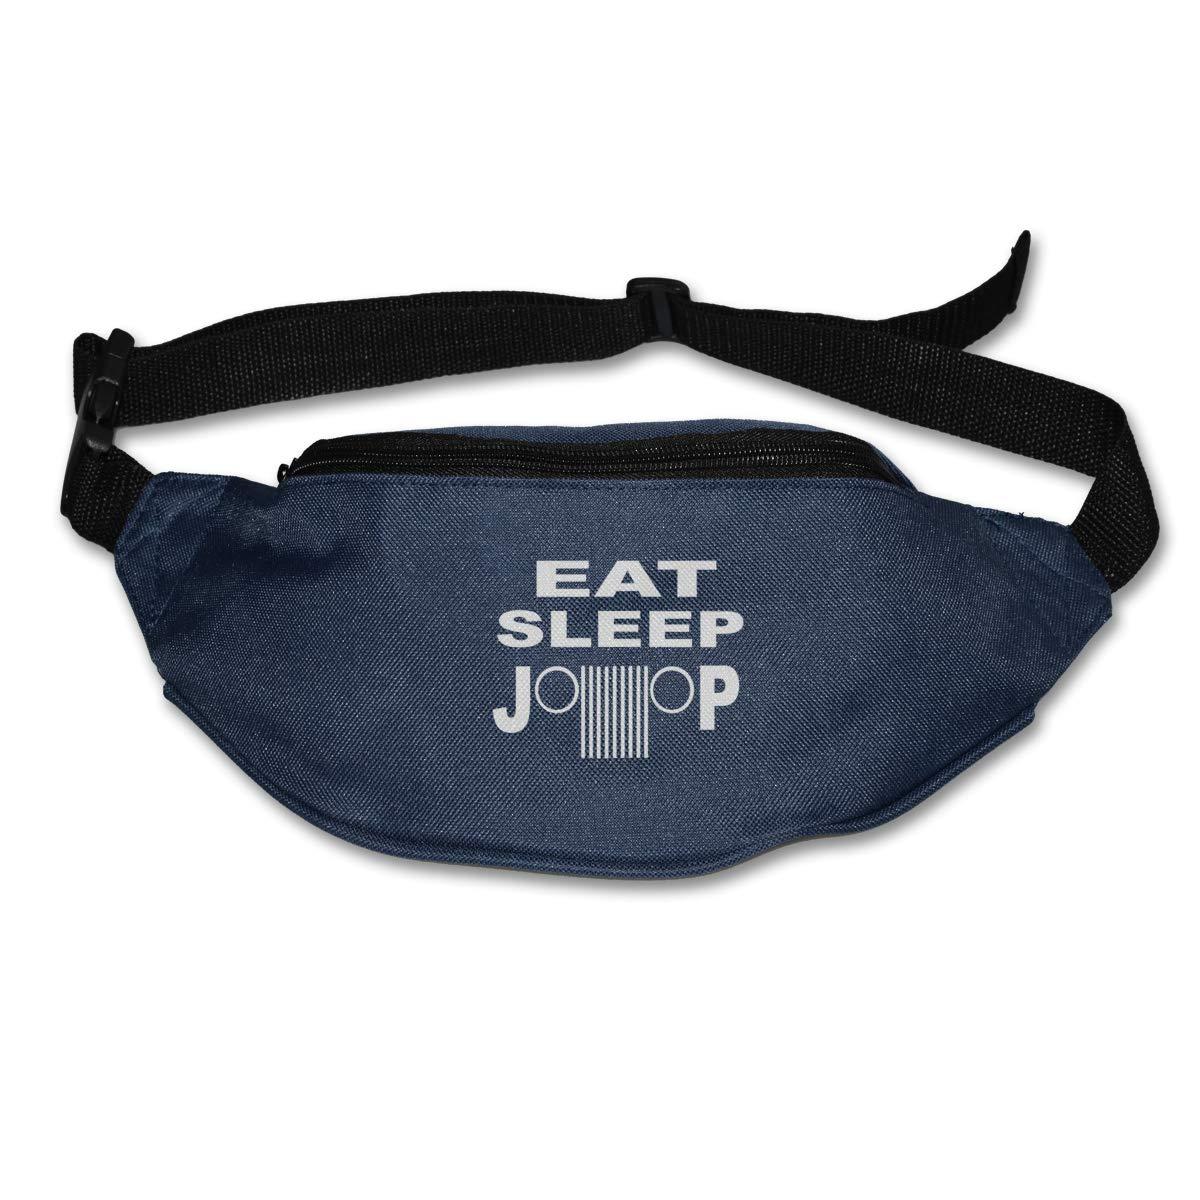 Eat Sleep Jeep Sport Waist Bag Fanny Pack Adjustable For Travel